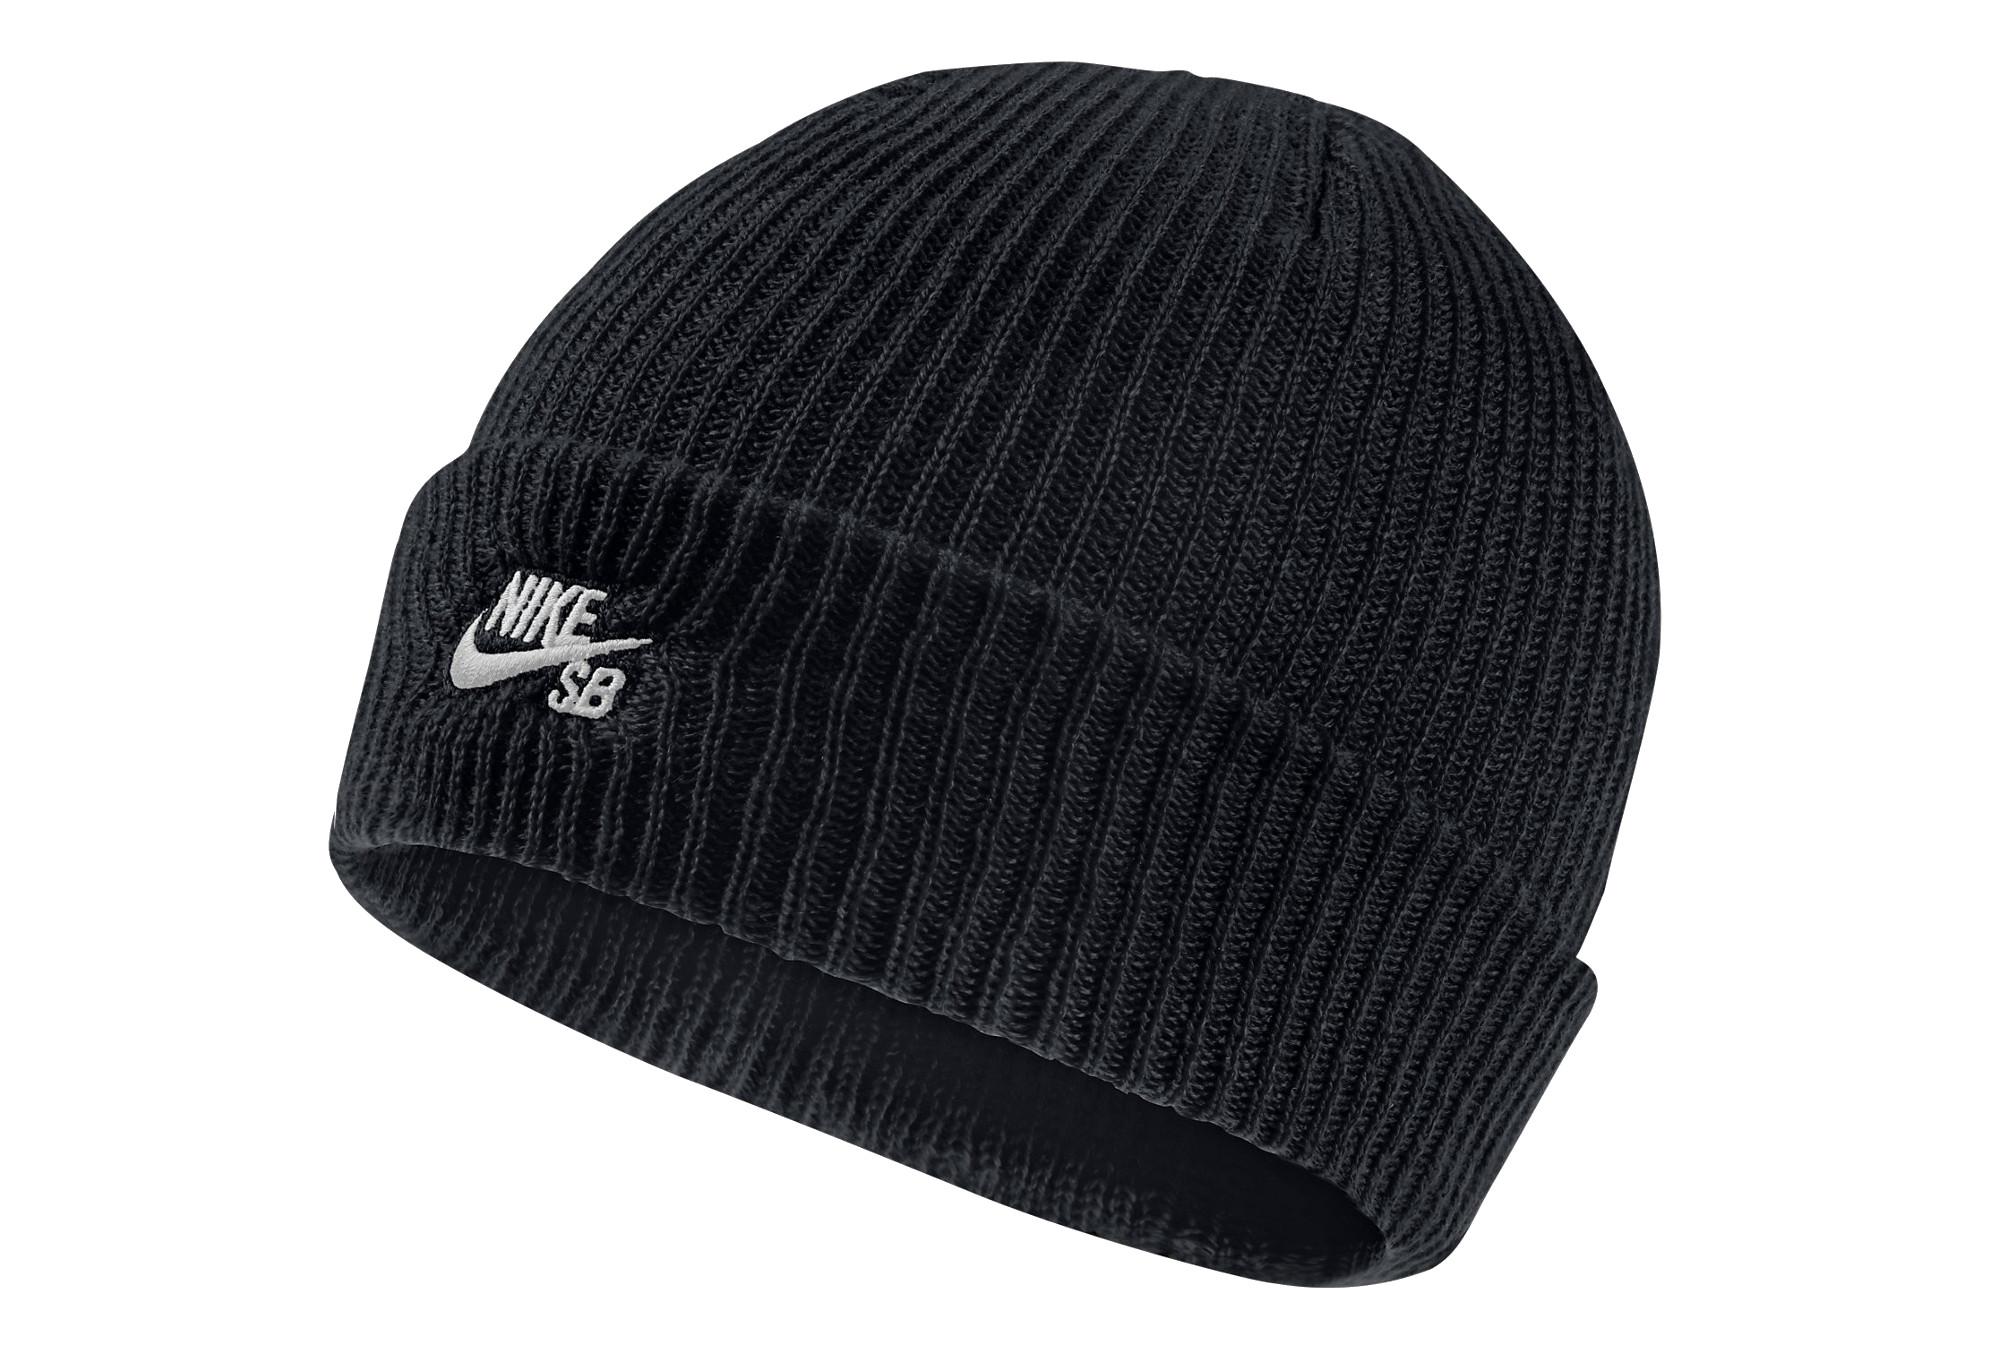 plataforma Cervecería Cancelar  Nike SB Fisherman Cap Black | Alltricks.com